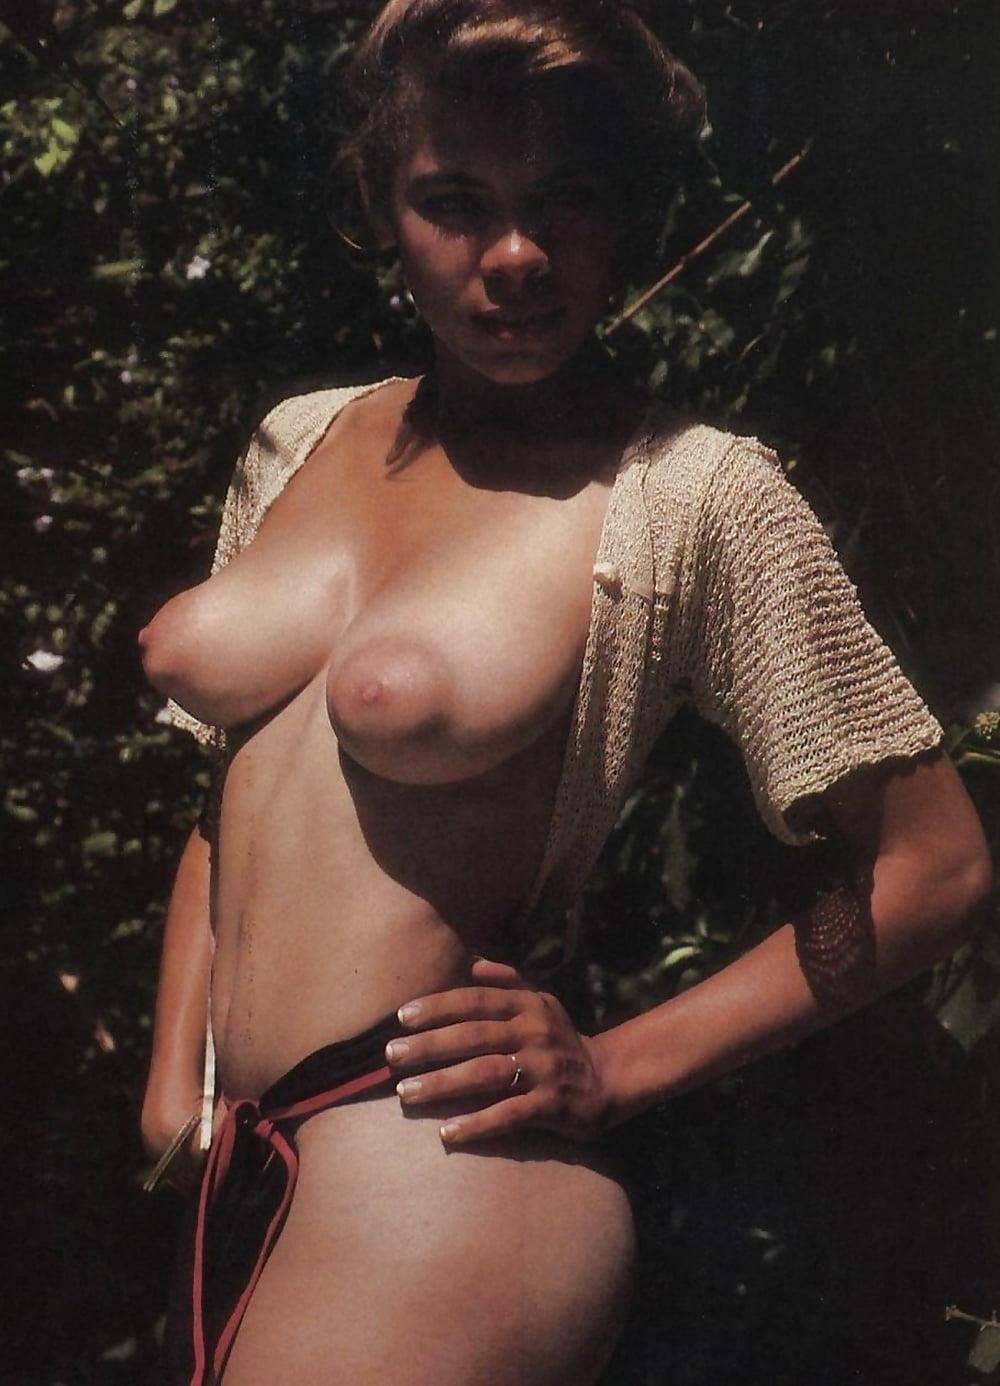 Nipple xxx retro photo galeries